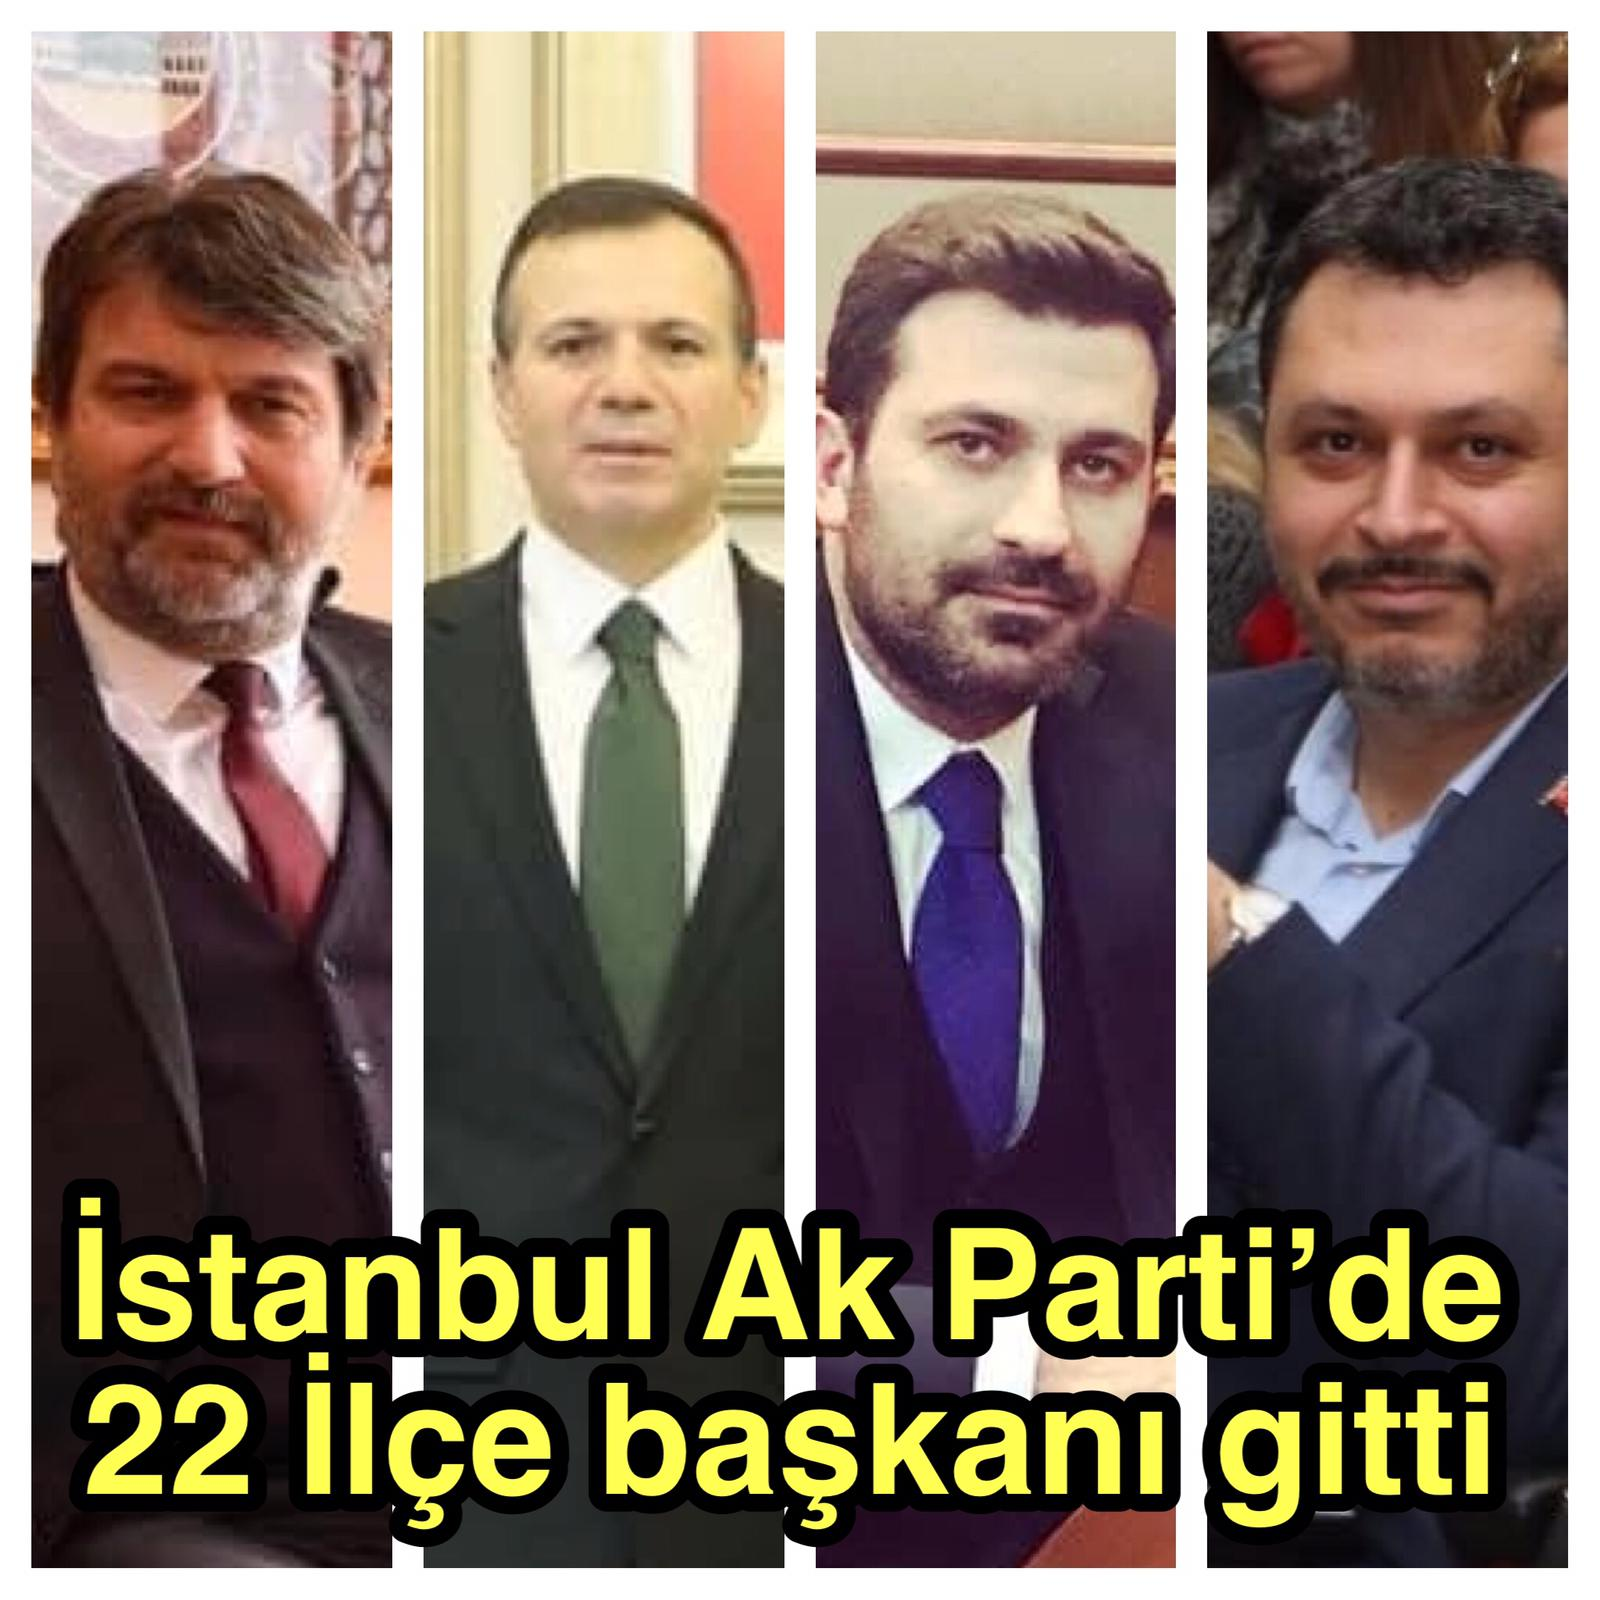 AK PARTİ İSTANBUL'DA 22 İLÇE BAŞKANI DEĞİŞTİ